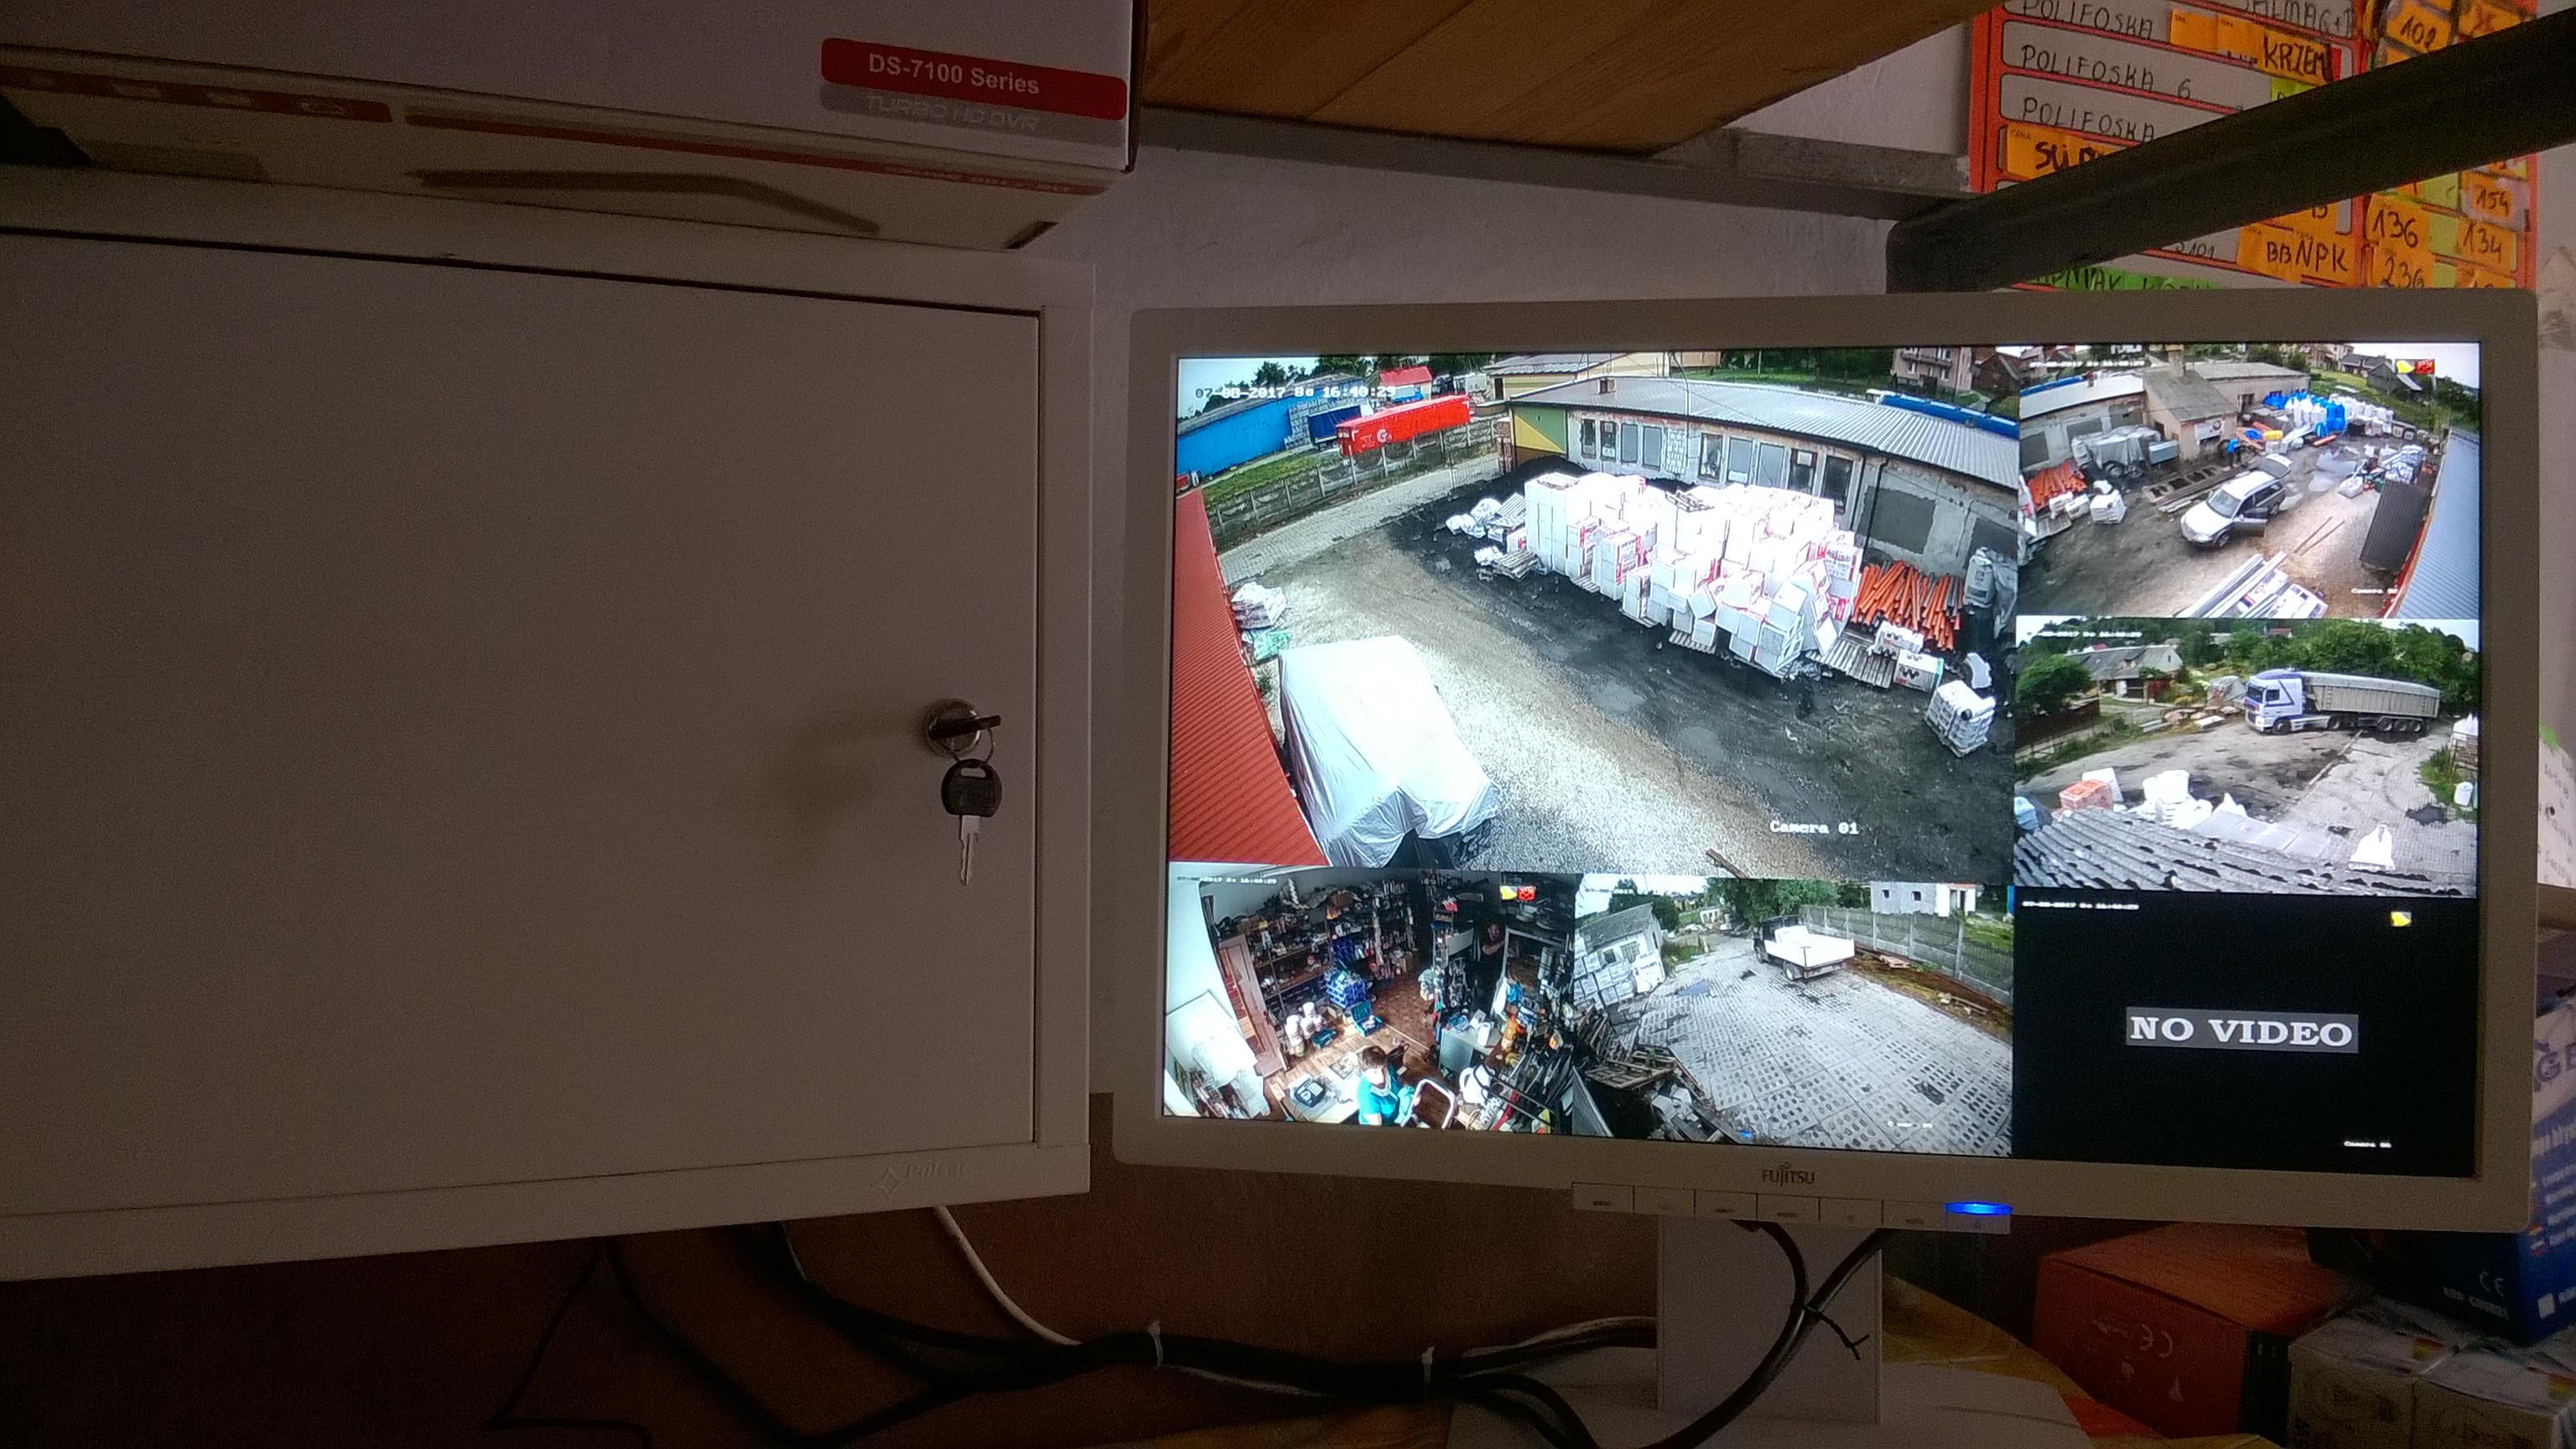 Monitoring Firmy Hurtowni - Inwestor okolice monitoring KRAŚNIK JANÓW LUBELSKI Leżajsk Monitoring FULL HD